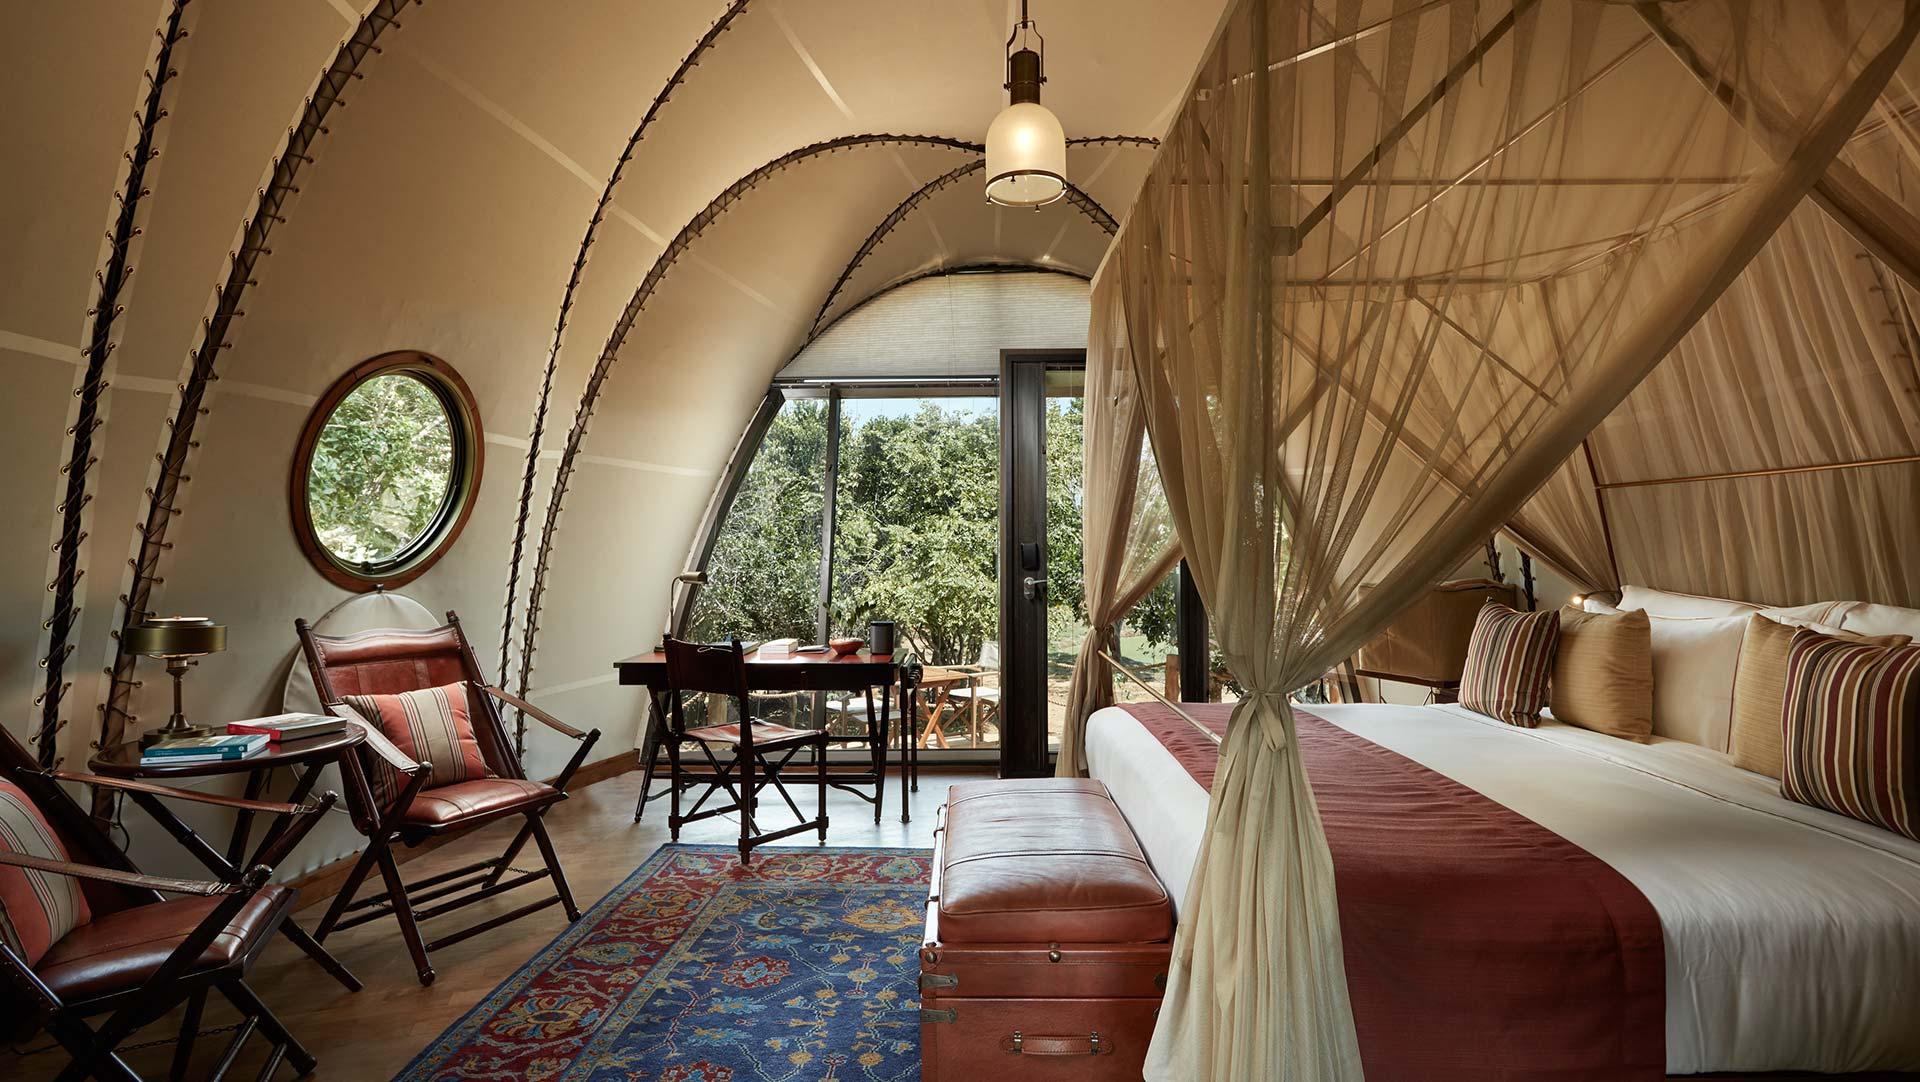 Luxury safari-style tents at Wild Coast Lodge, Sri Lanka